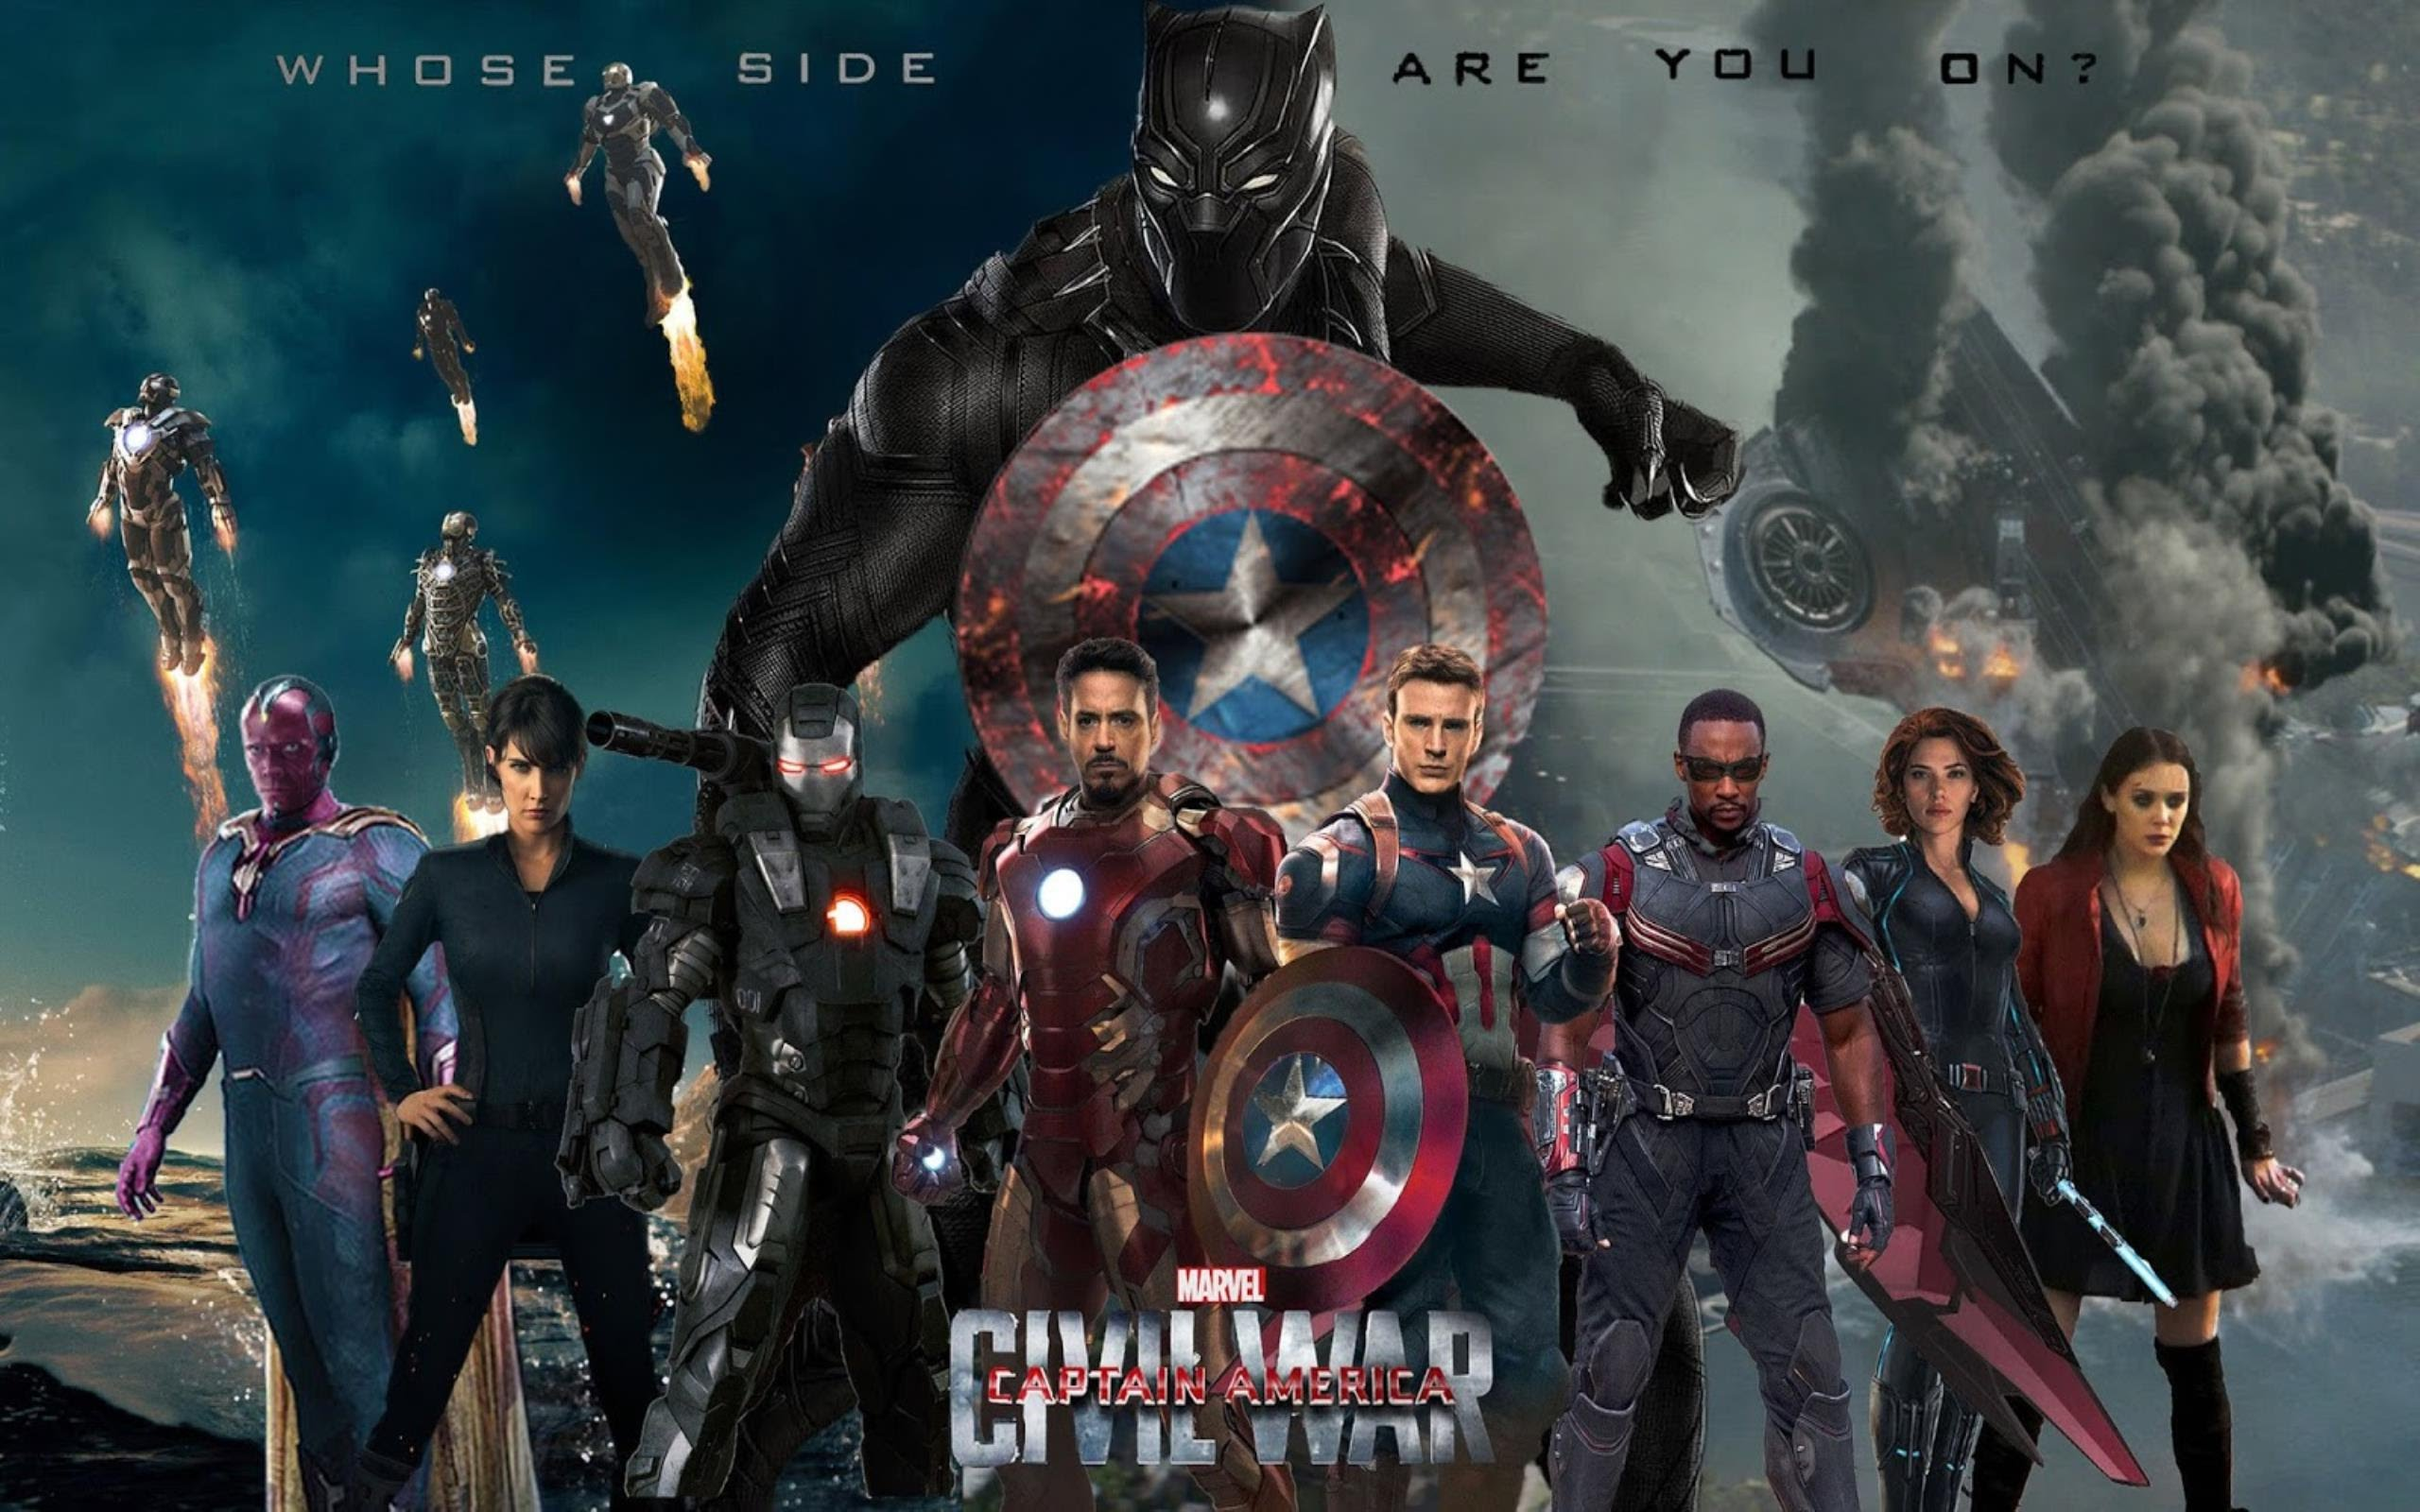 Captain America: Civil War Background